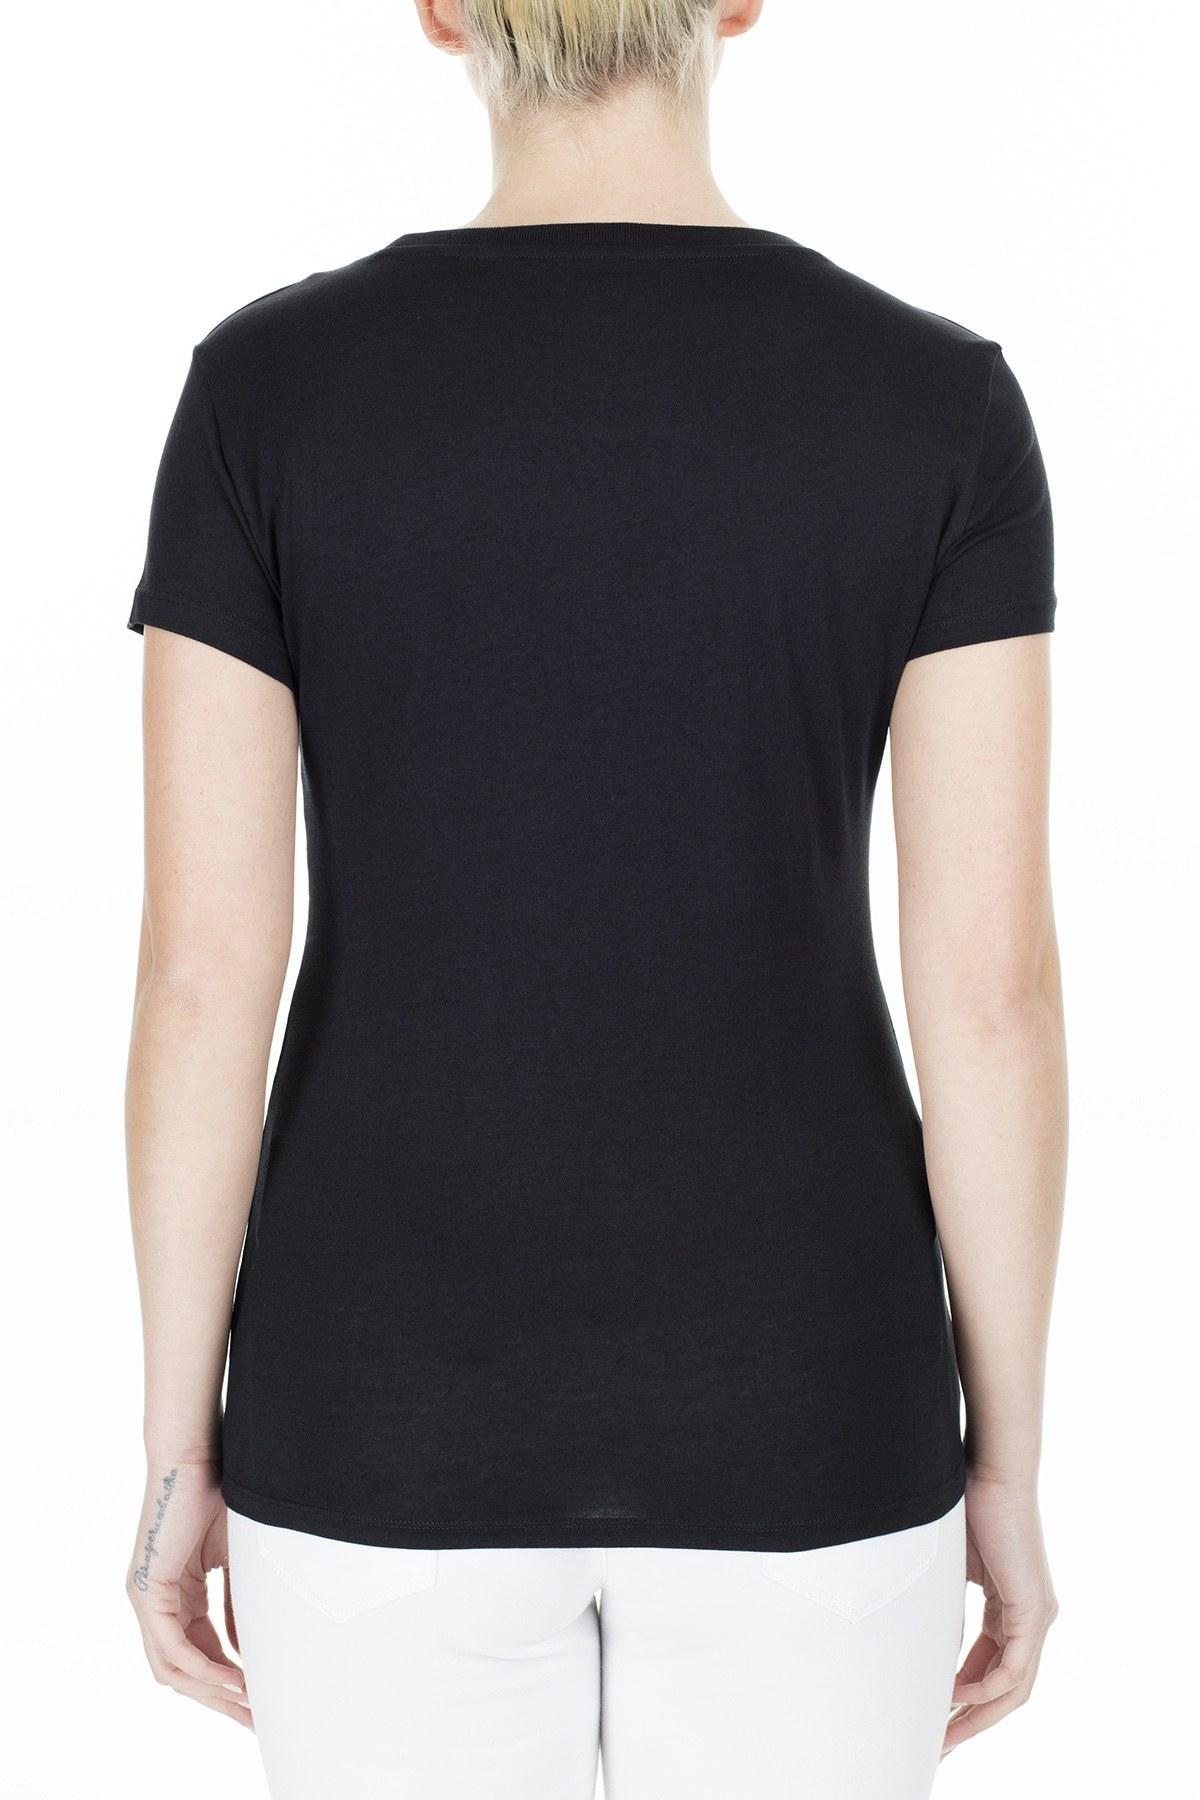 Armani Exchange Regular Fit Kadın T Shirt 3HYTAH YJ73Z 1200 SİYAH